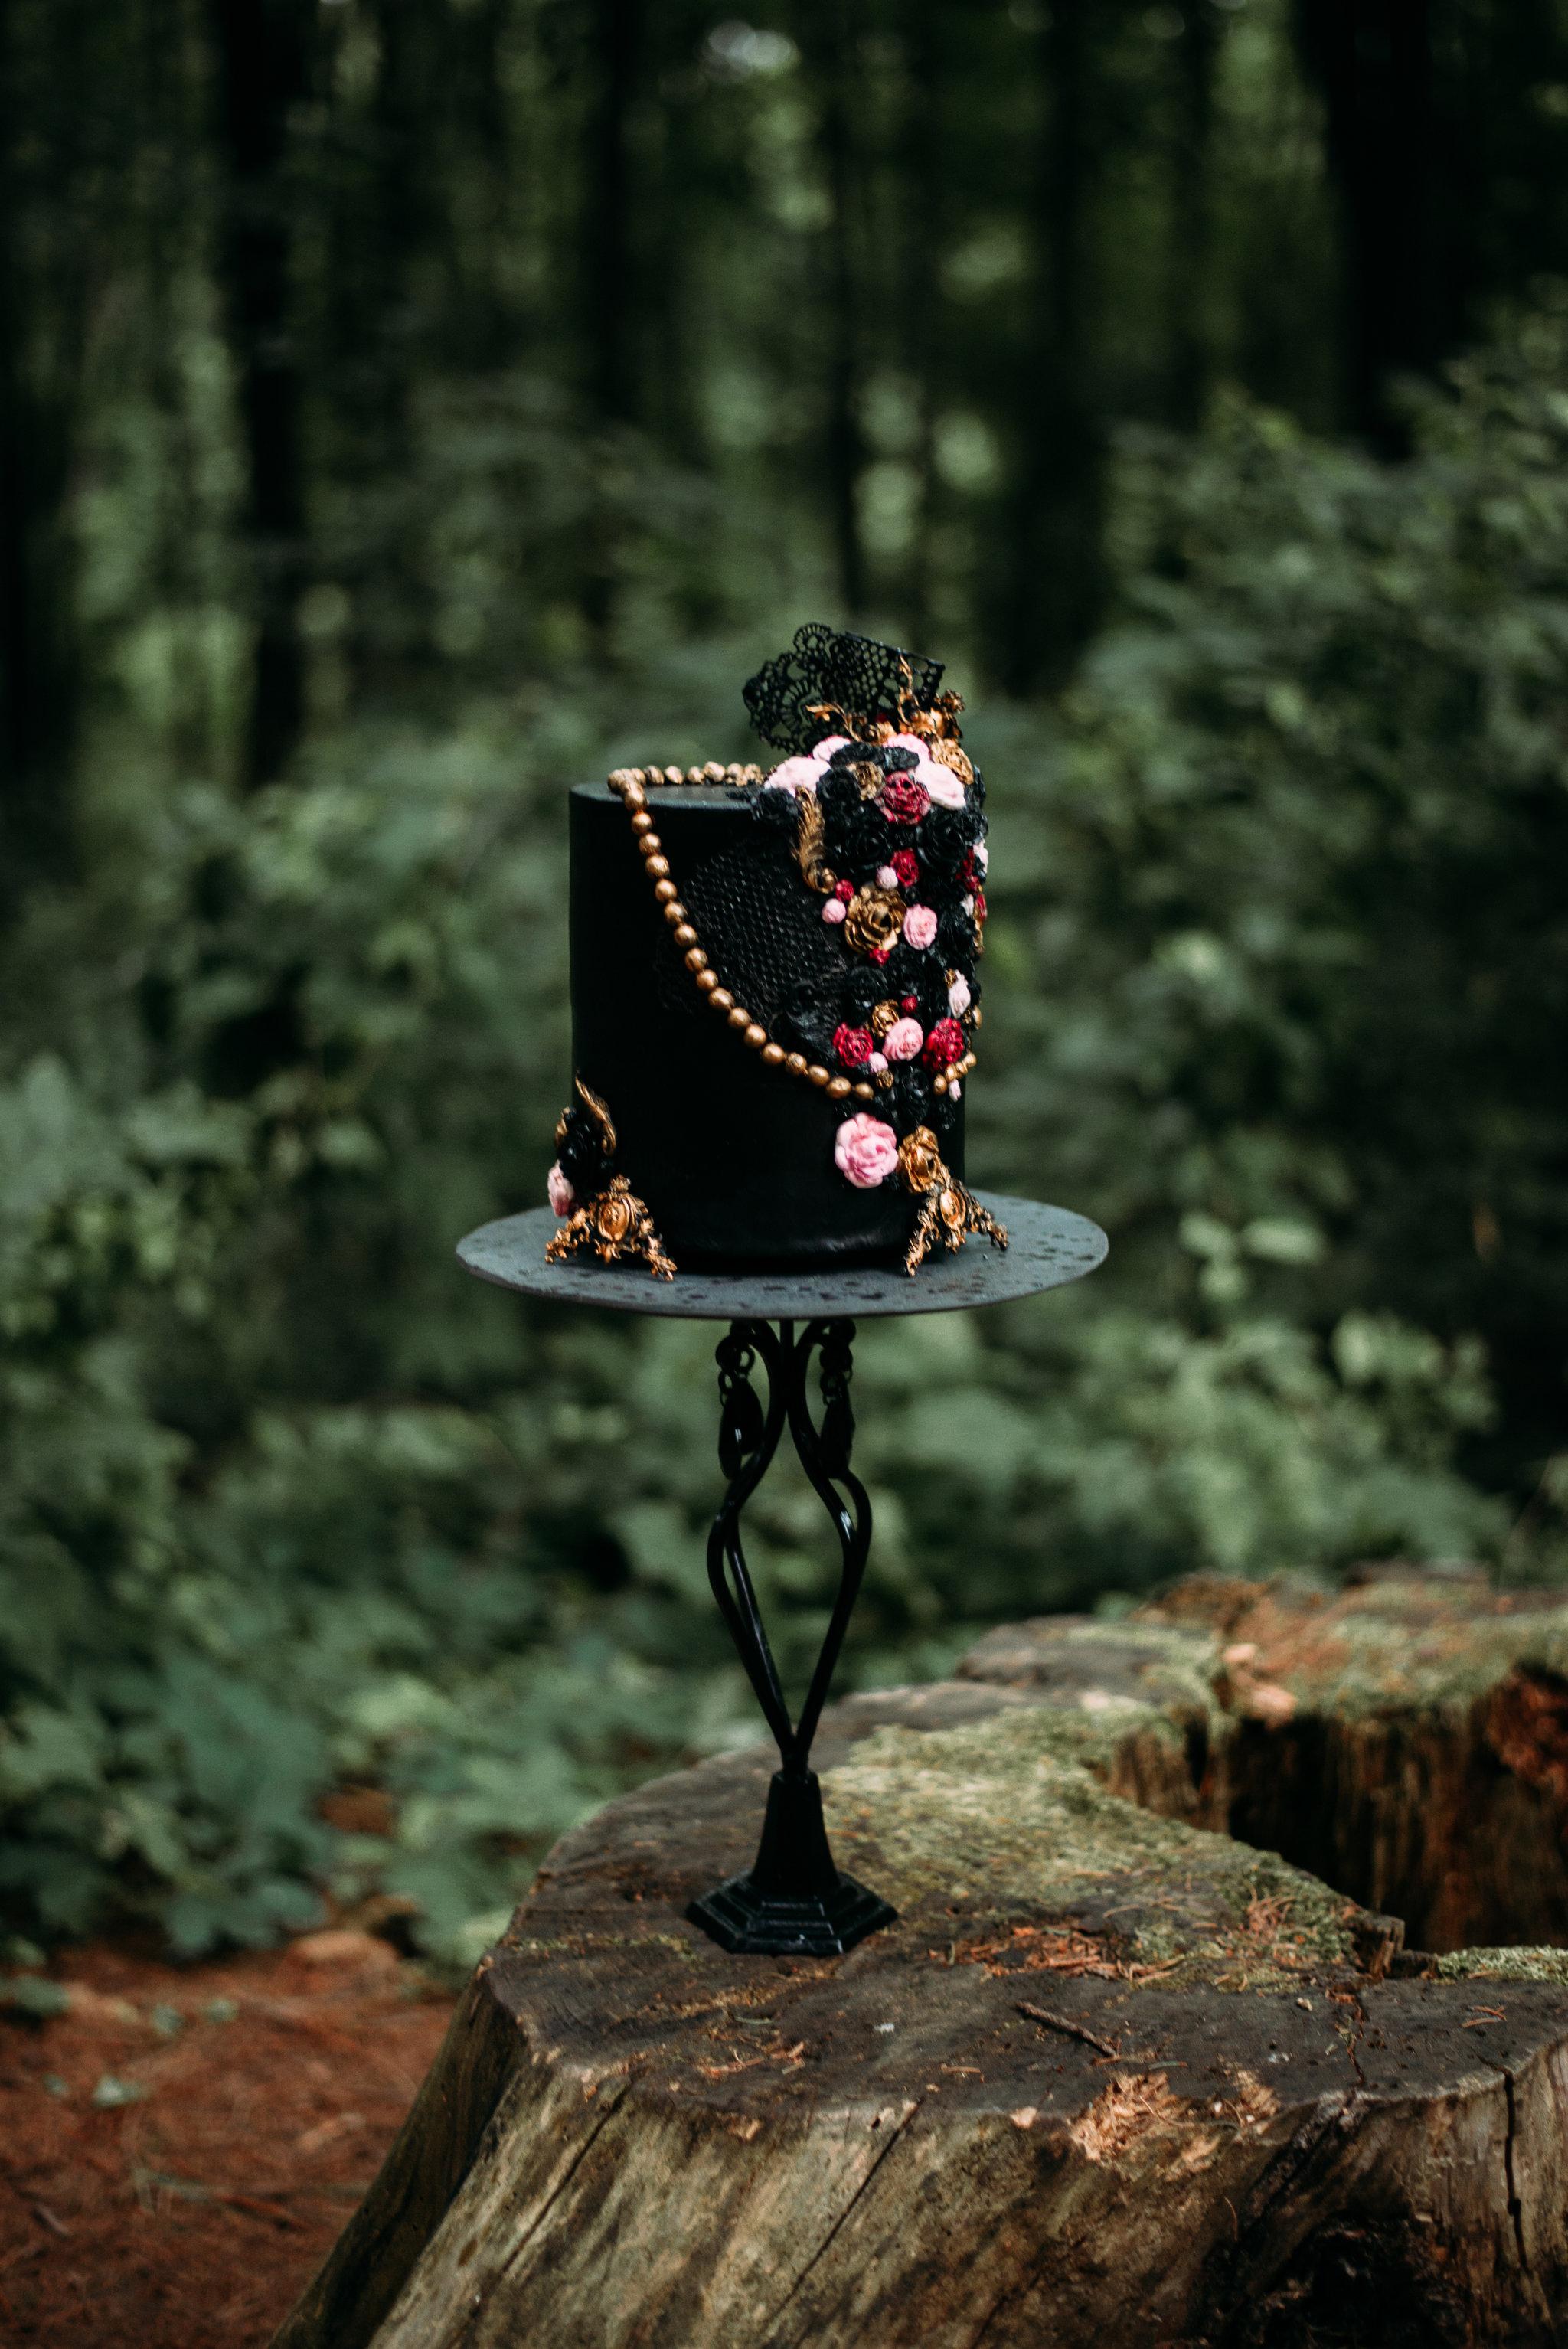 Black Wedding Cake - Moody Wedding - Black Lace Wedding Dress - Moody Pink + White Wedding Bouquet -- Wedding Blog - The Overwhelmed Bride